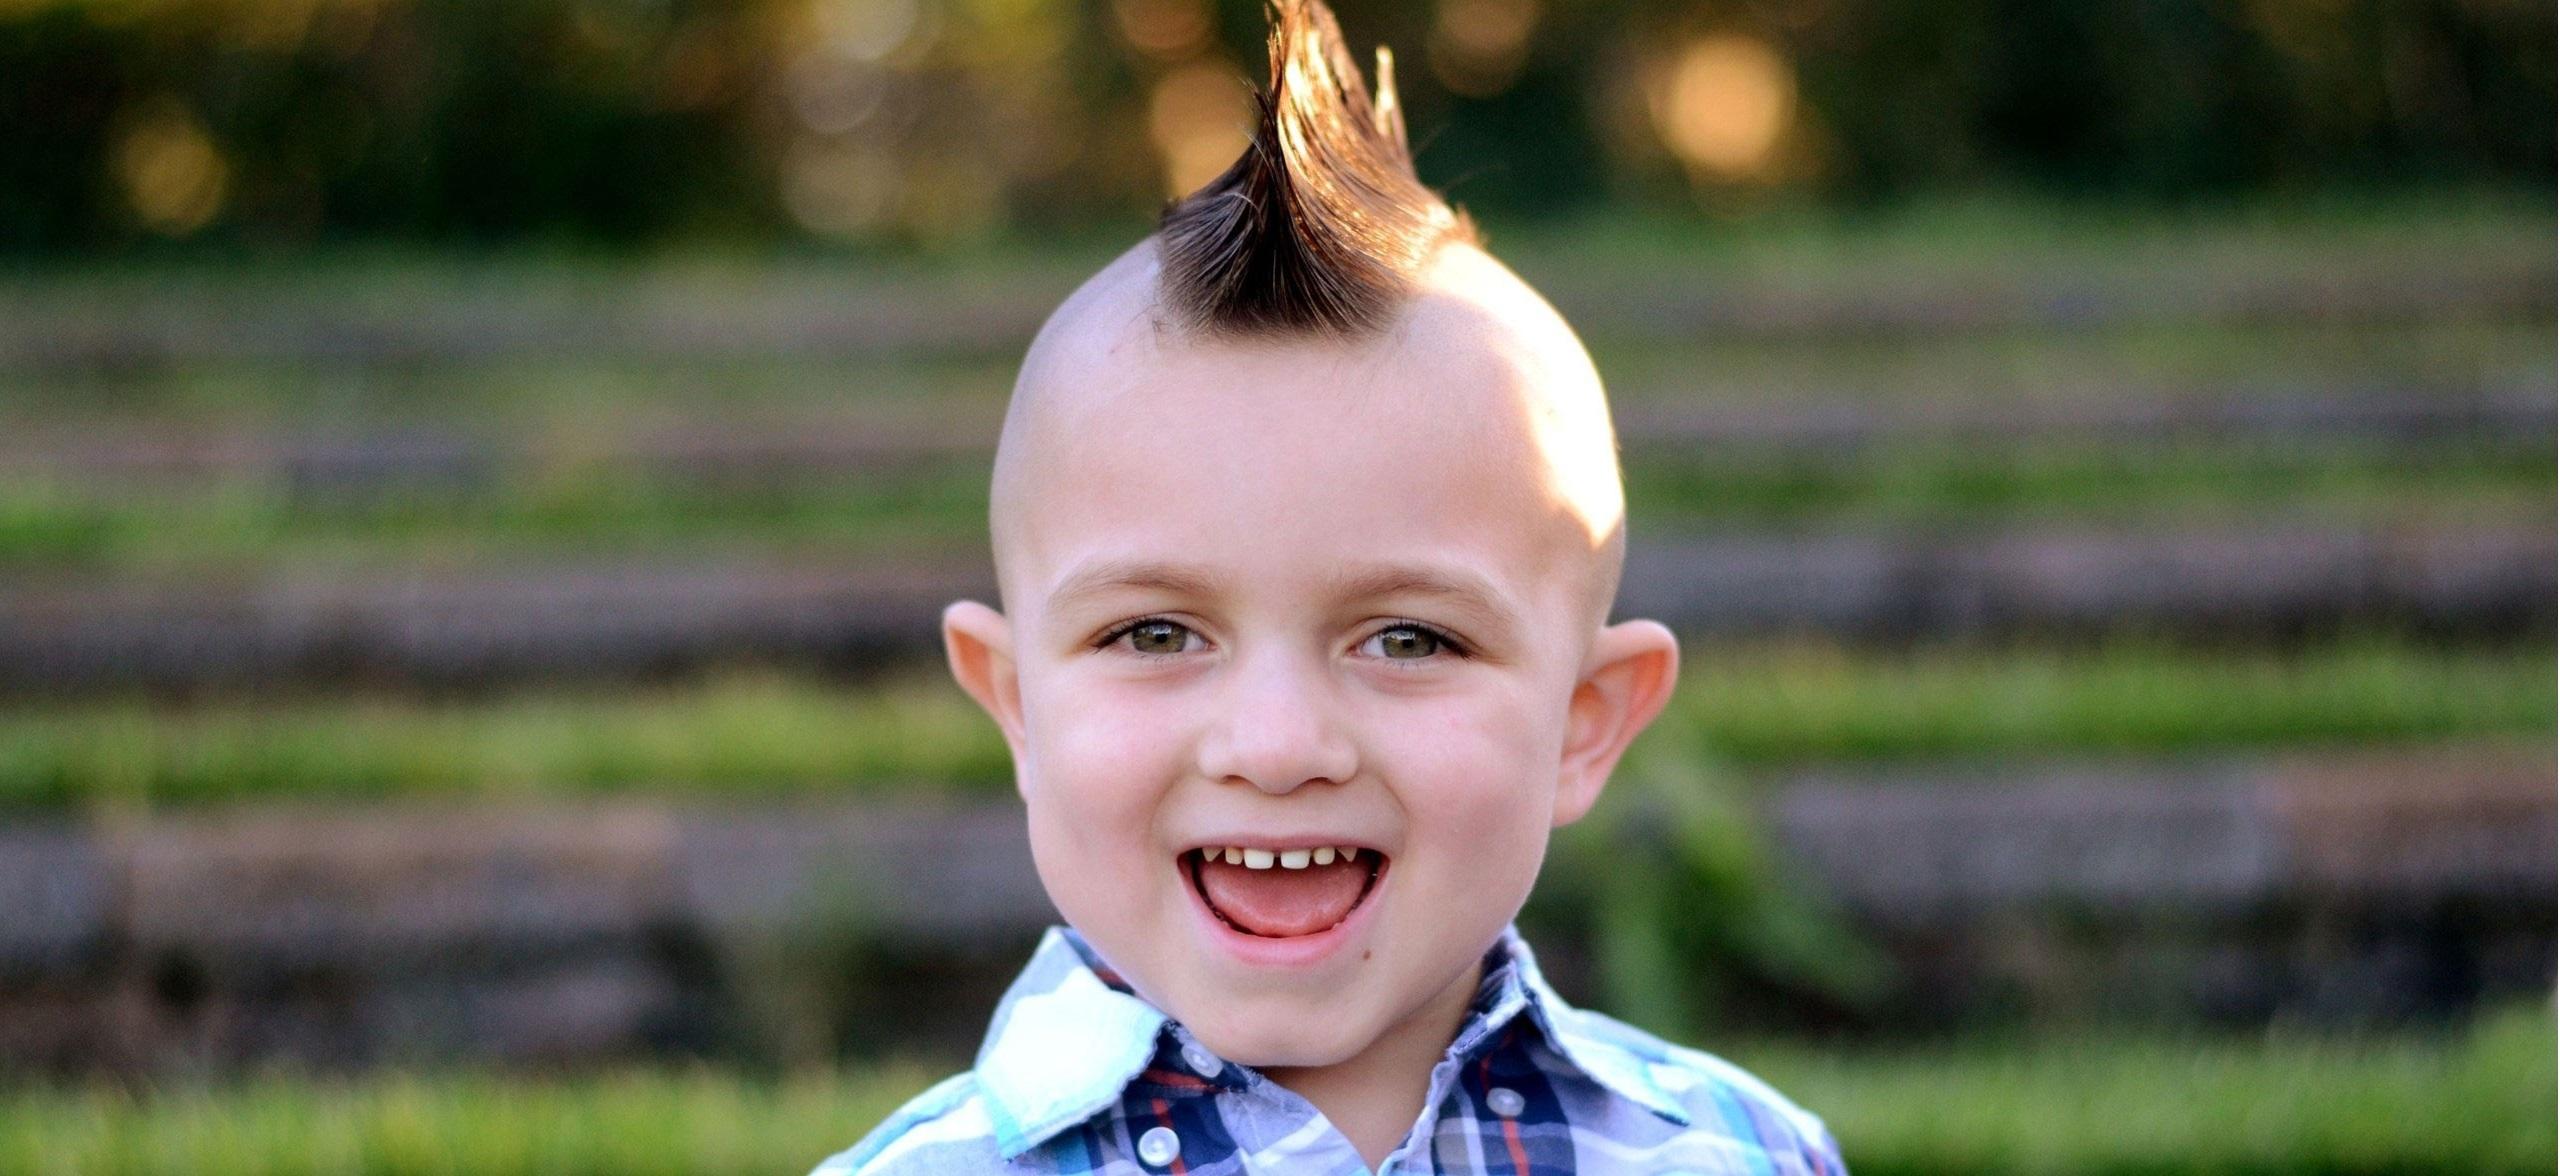 Free Photo: Little Boy